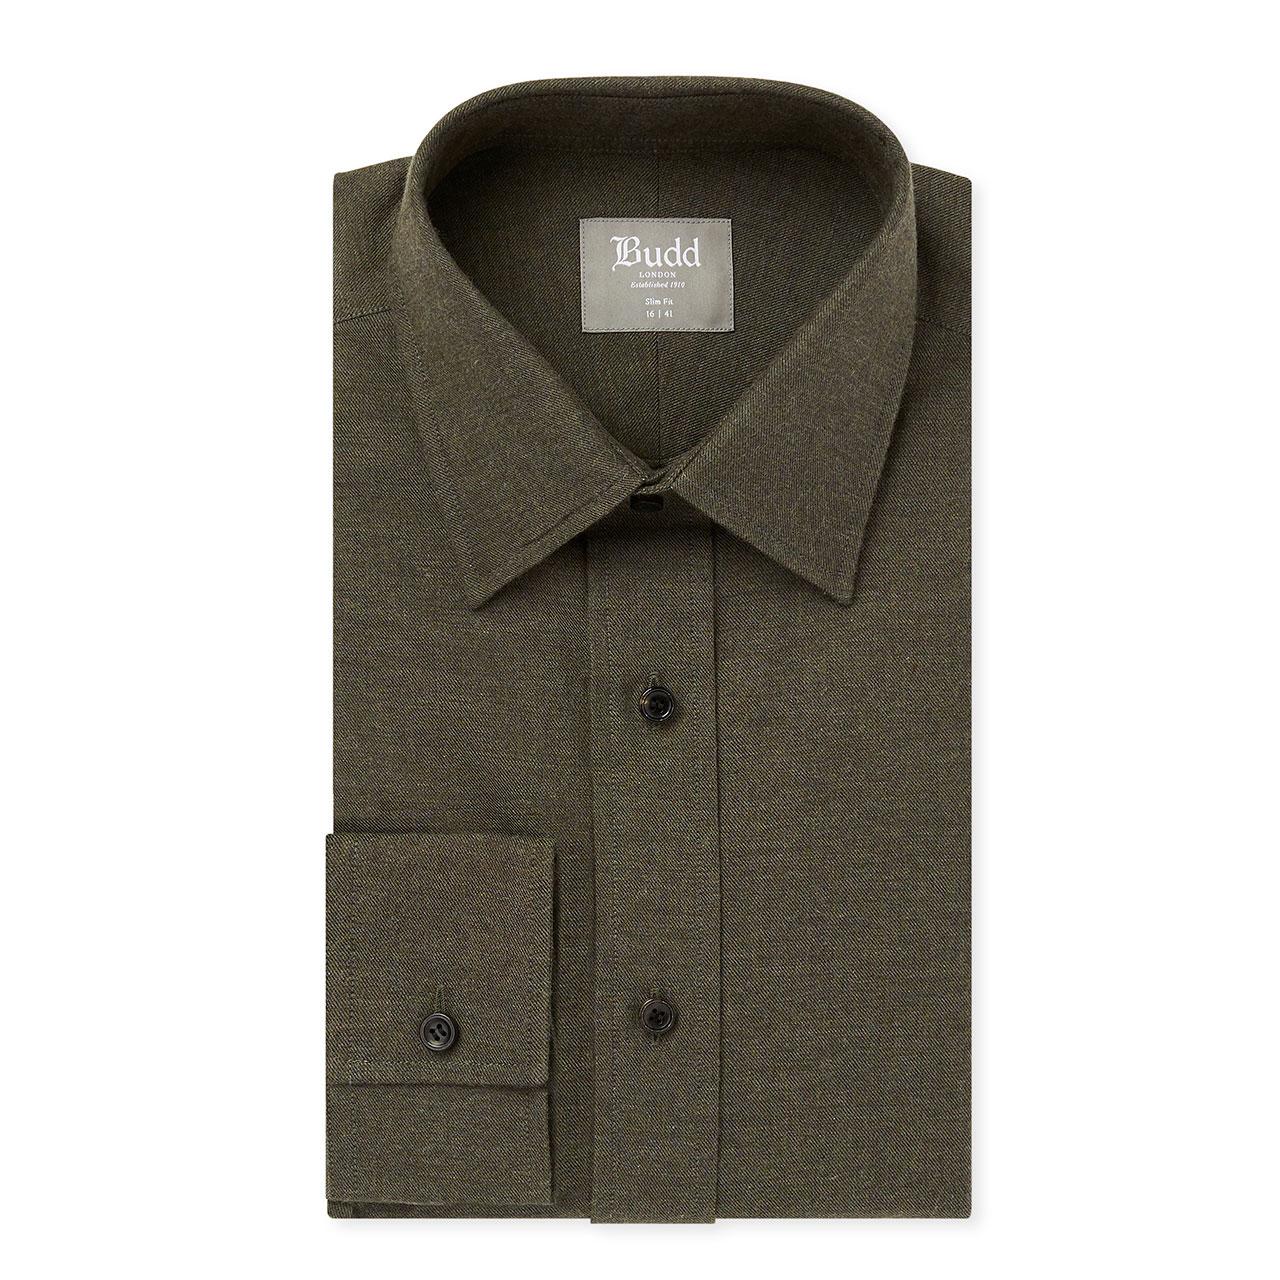 Slim Fit Plain Brushed Cotton Button Cuff Shirt in Khaki